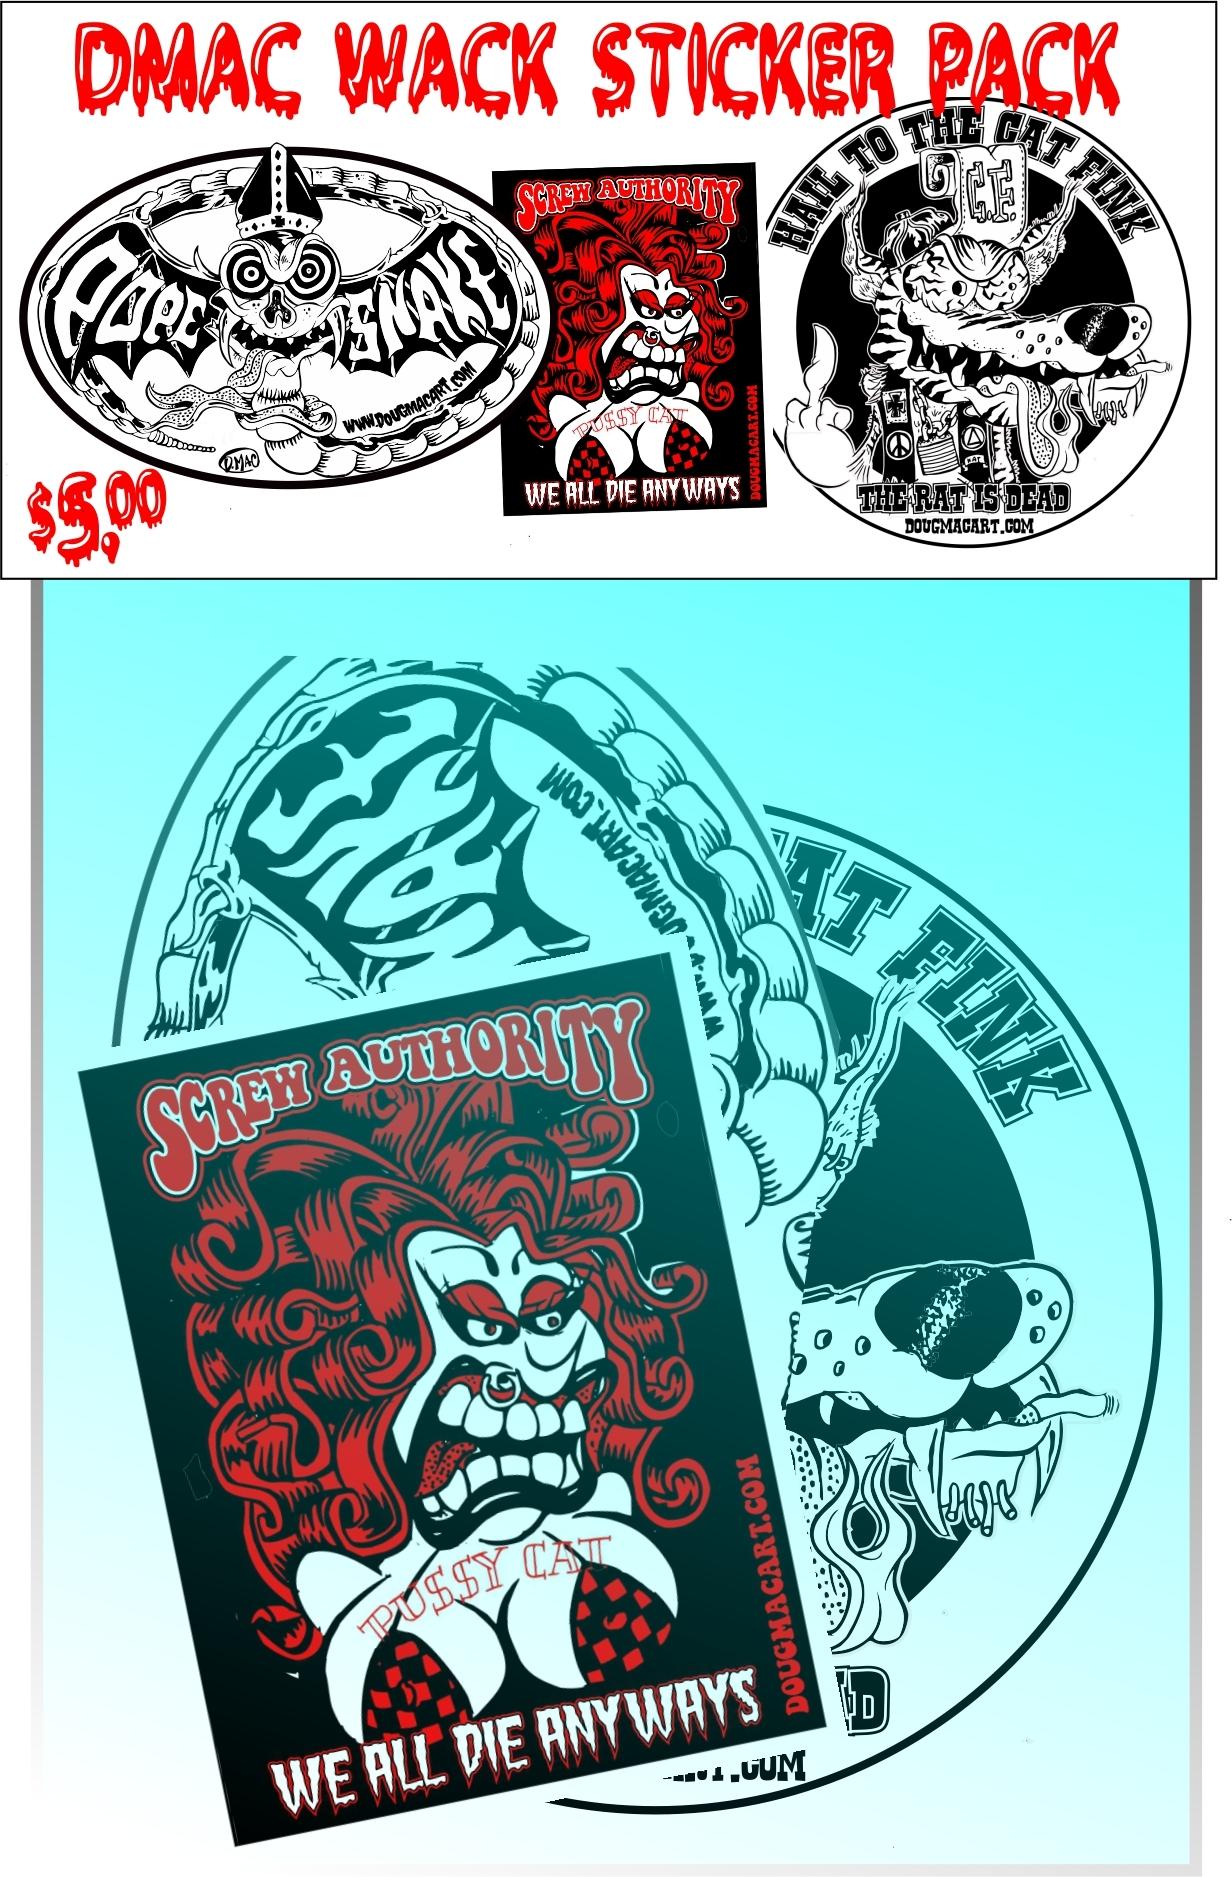 DMac Wack Sticker Pack 00060